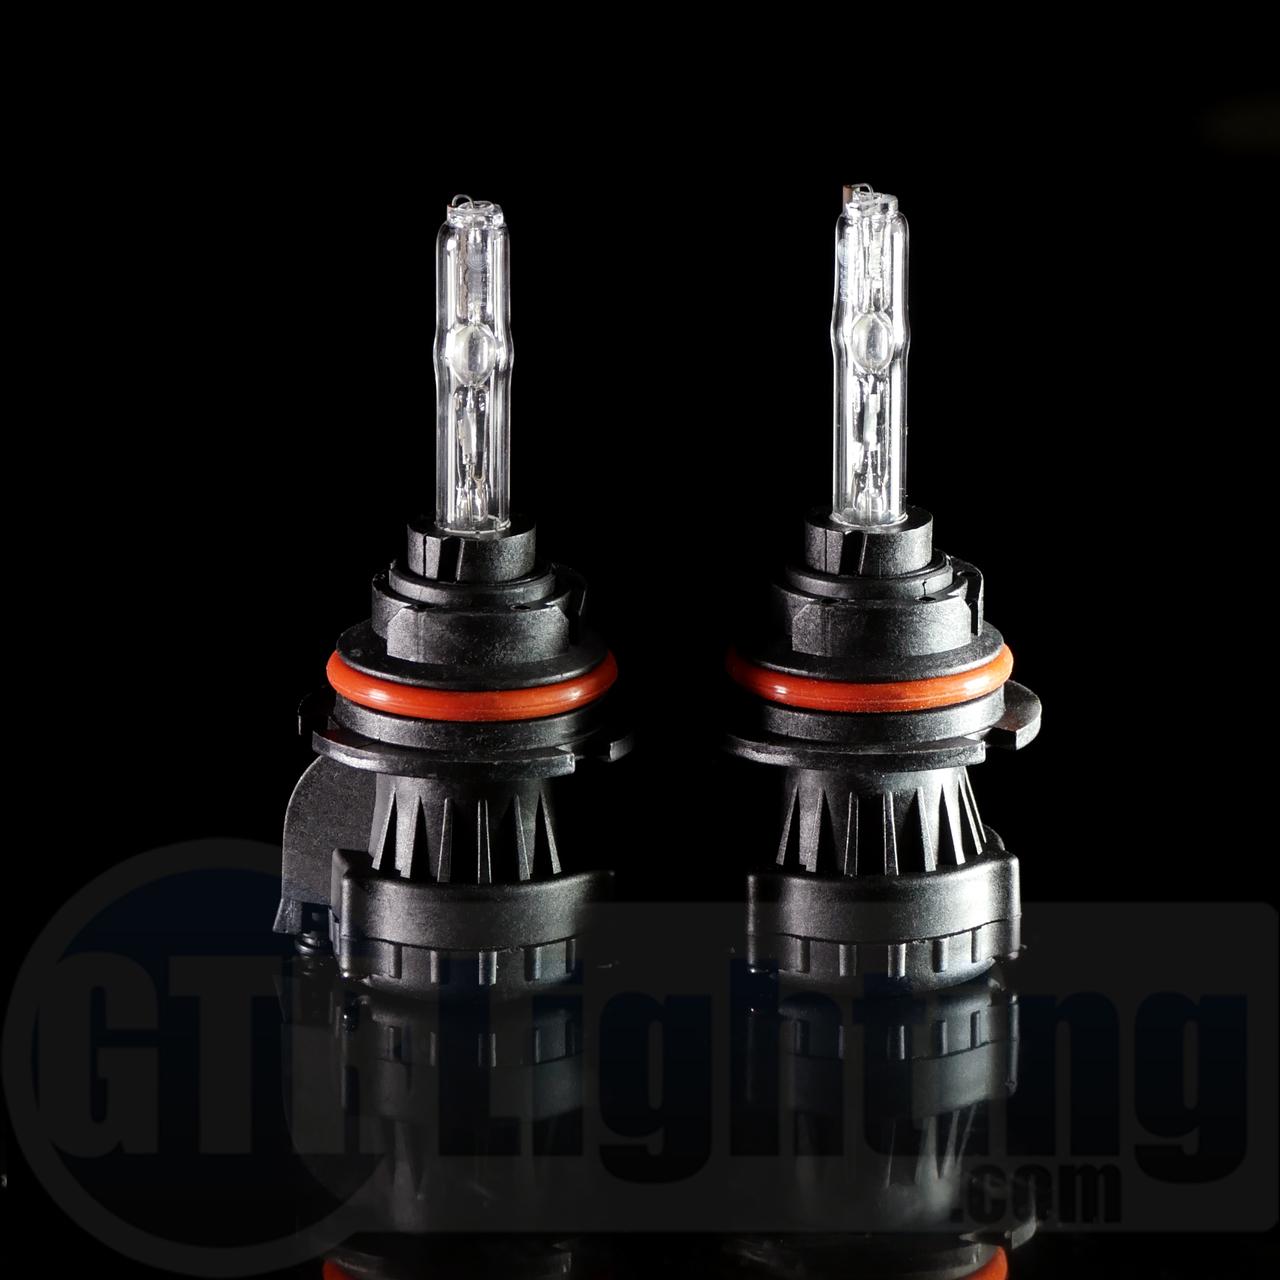 headlight lens gtr lighting 35w 55w dual beam hid bulbs  [ 1280 x 1280 Pixel ]